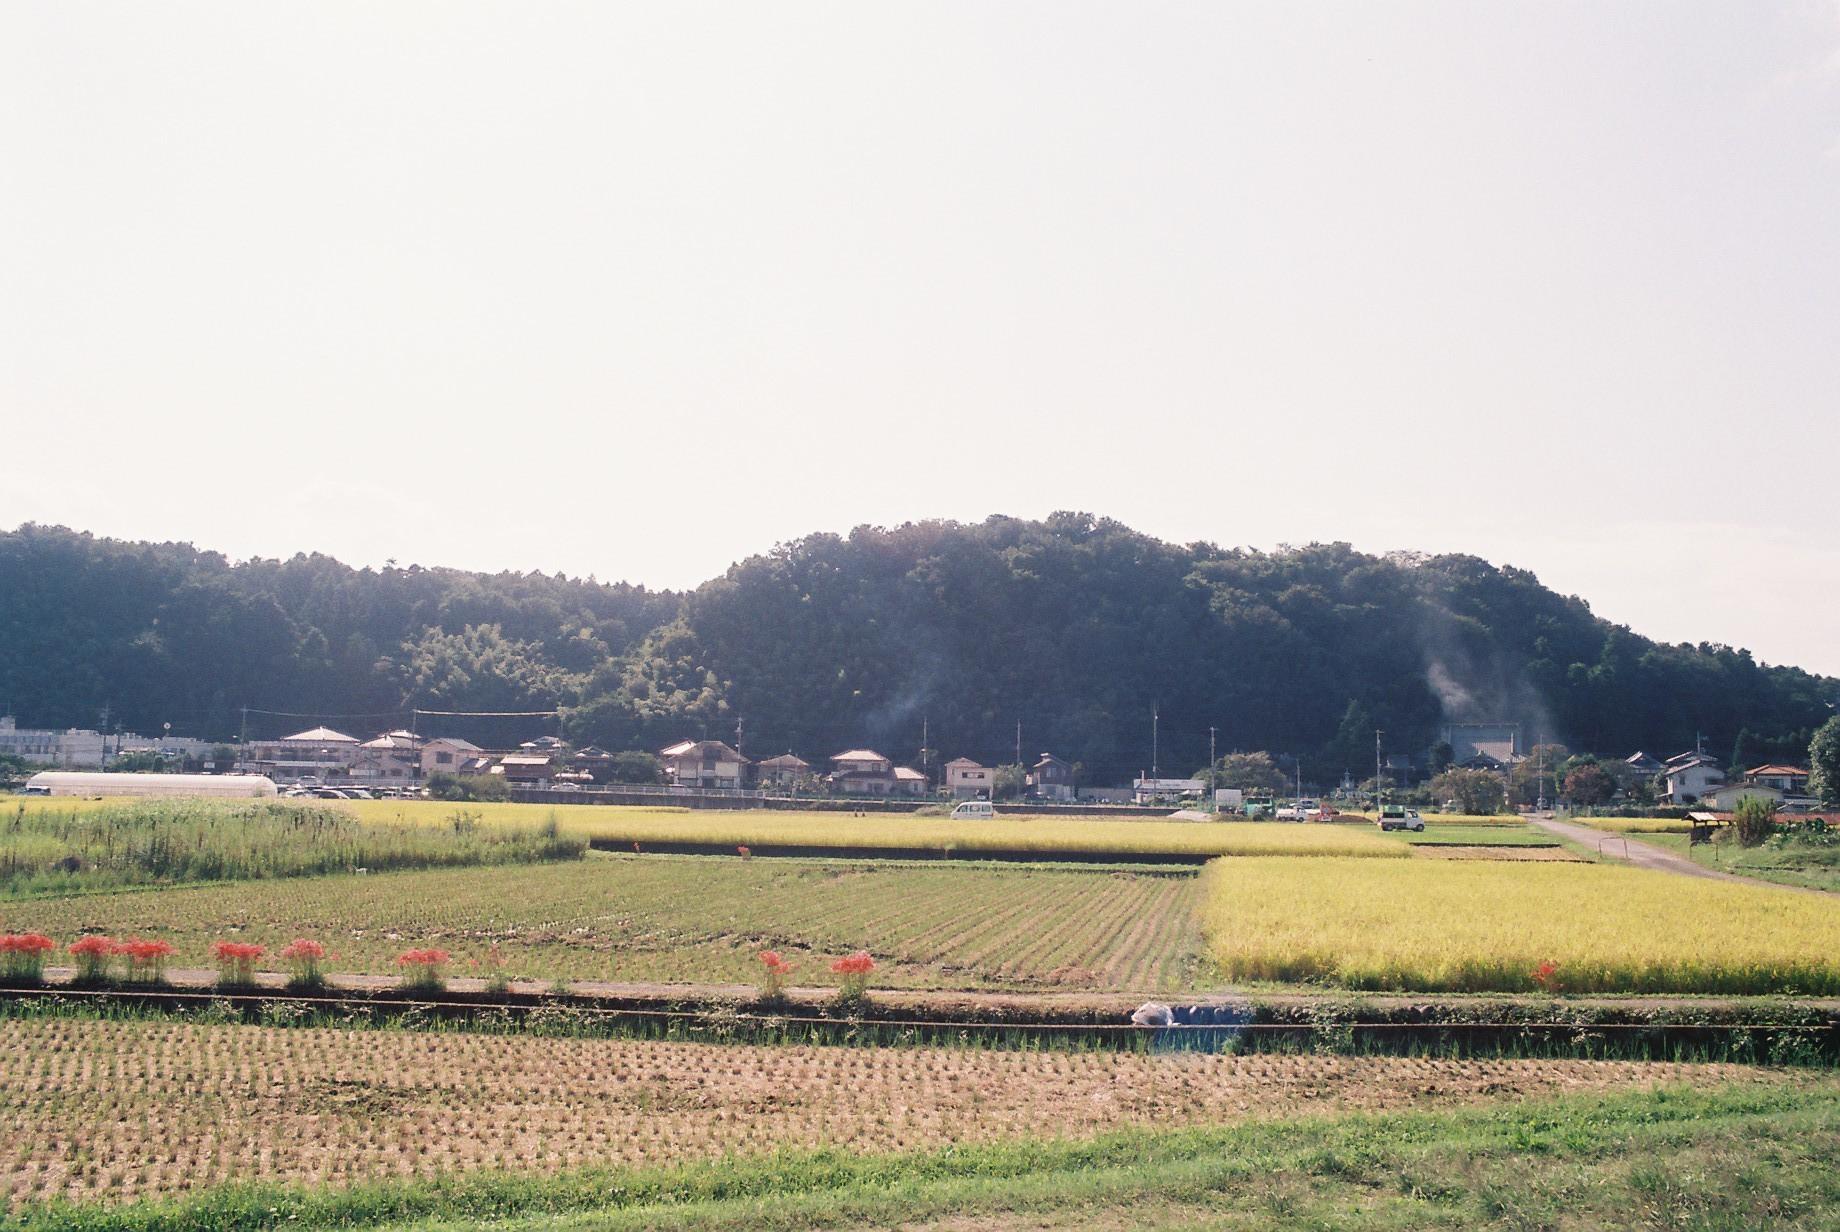 FH010018.JPG